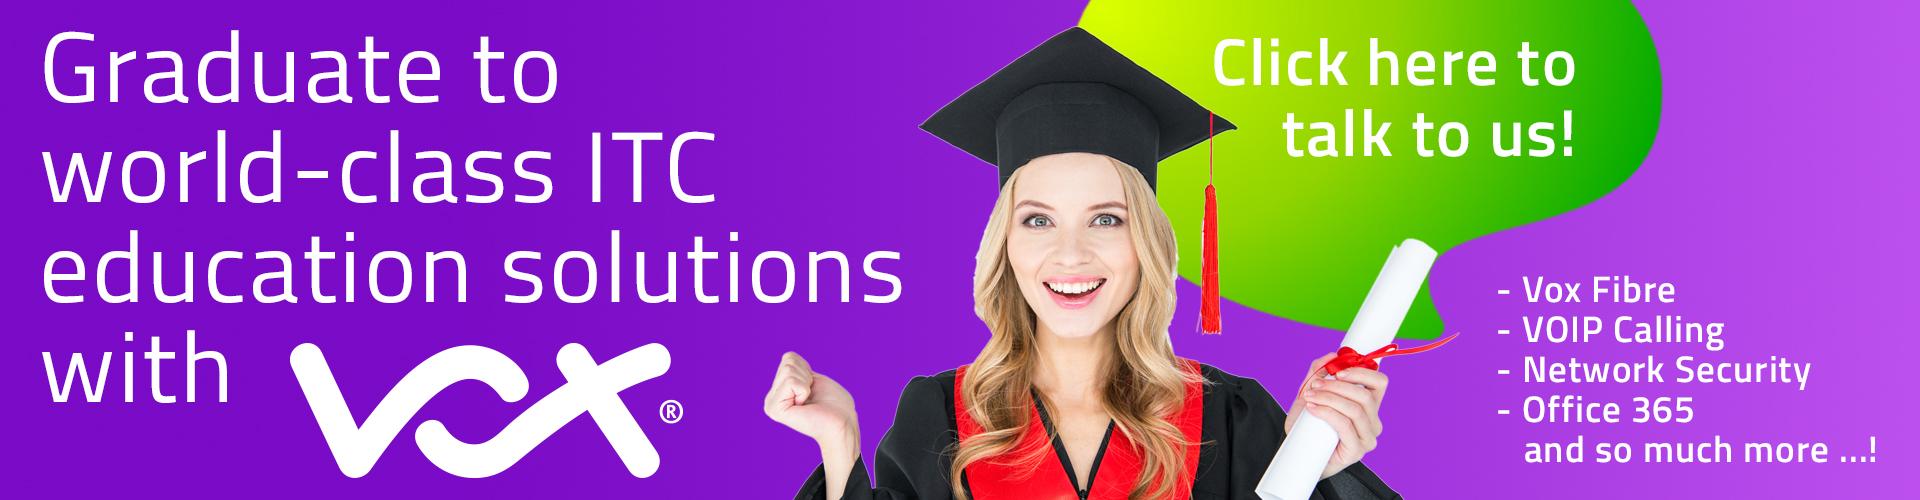 Graduate to Vox